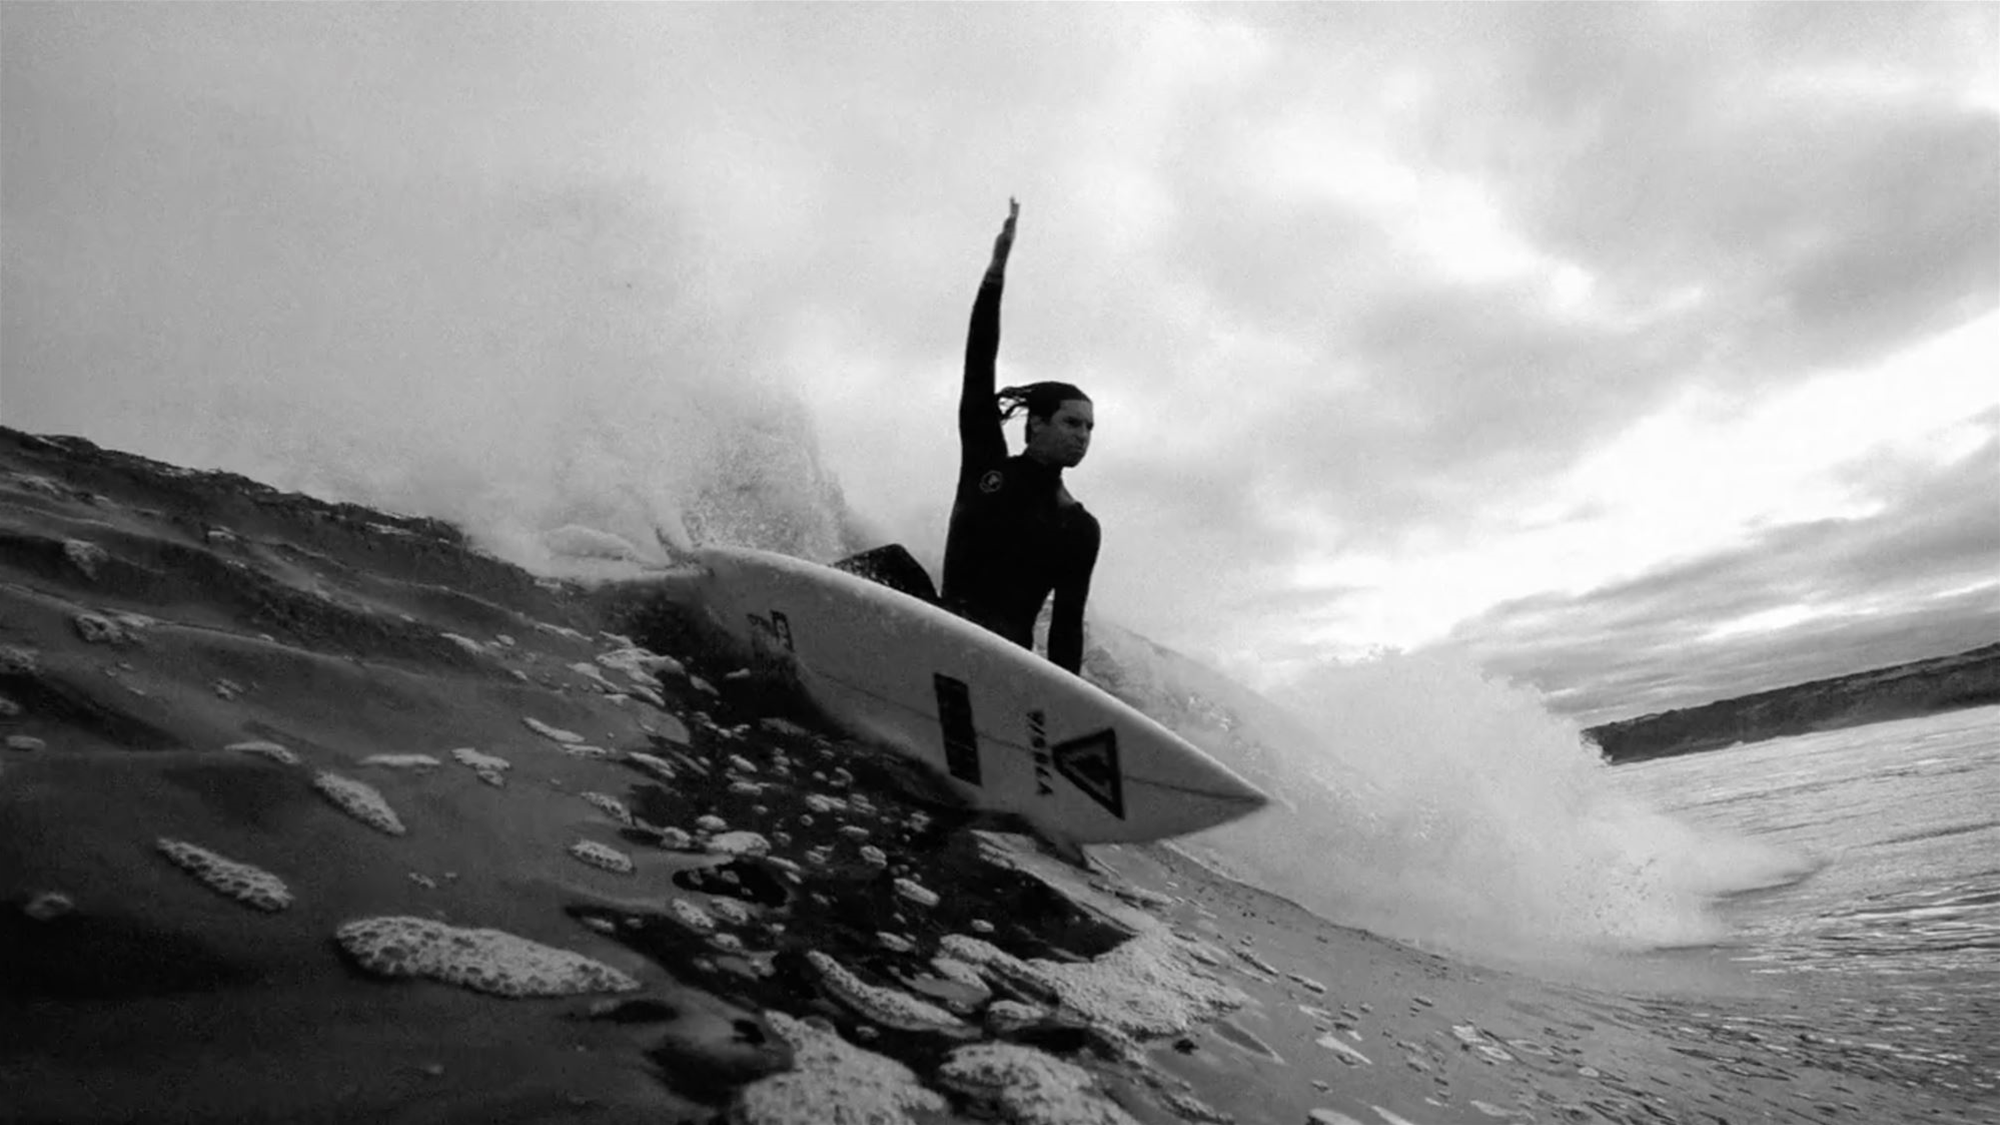 Brendon Gibbens in Black & White